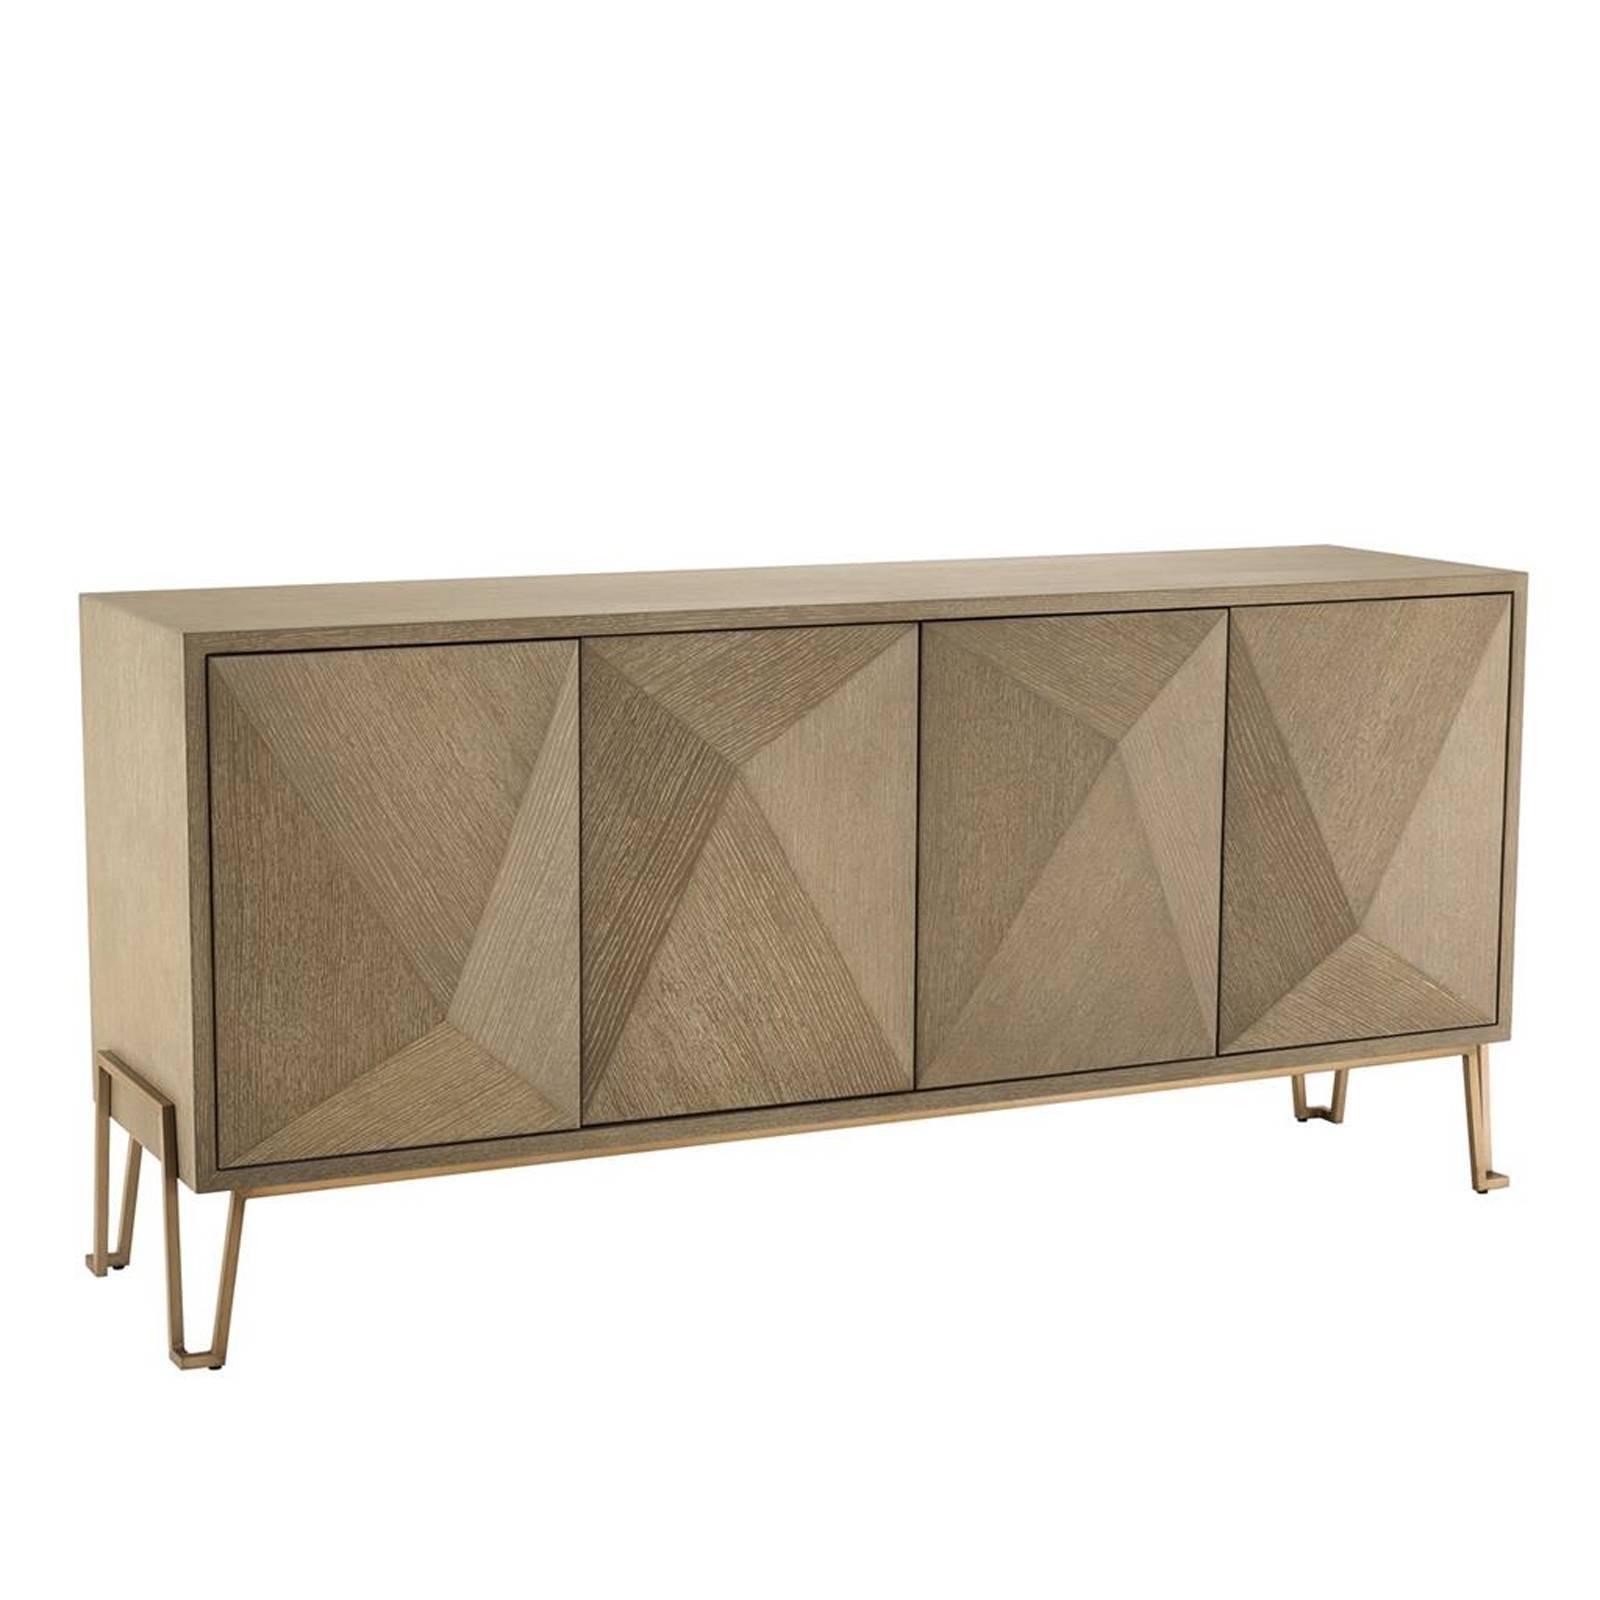 Oak Wooden and Brass Art Deco Style Sideboard